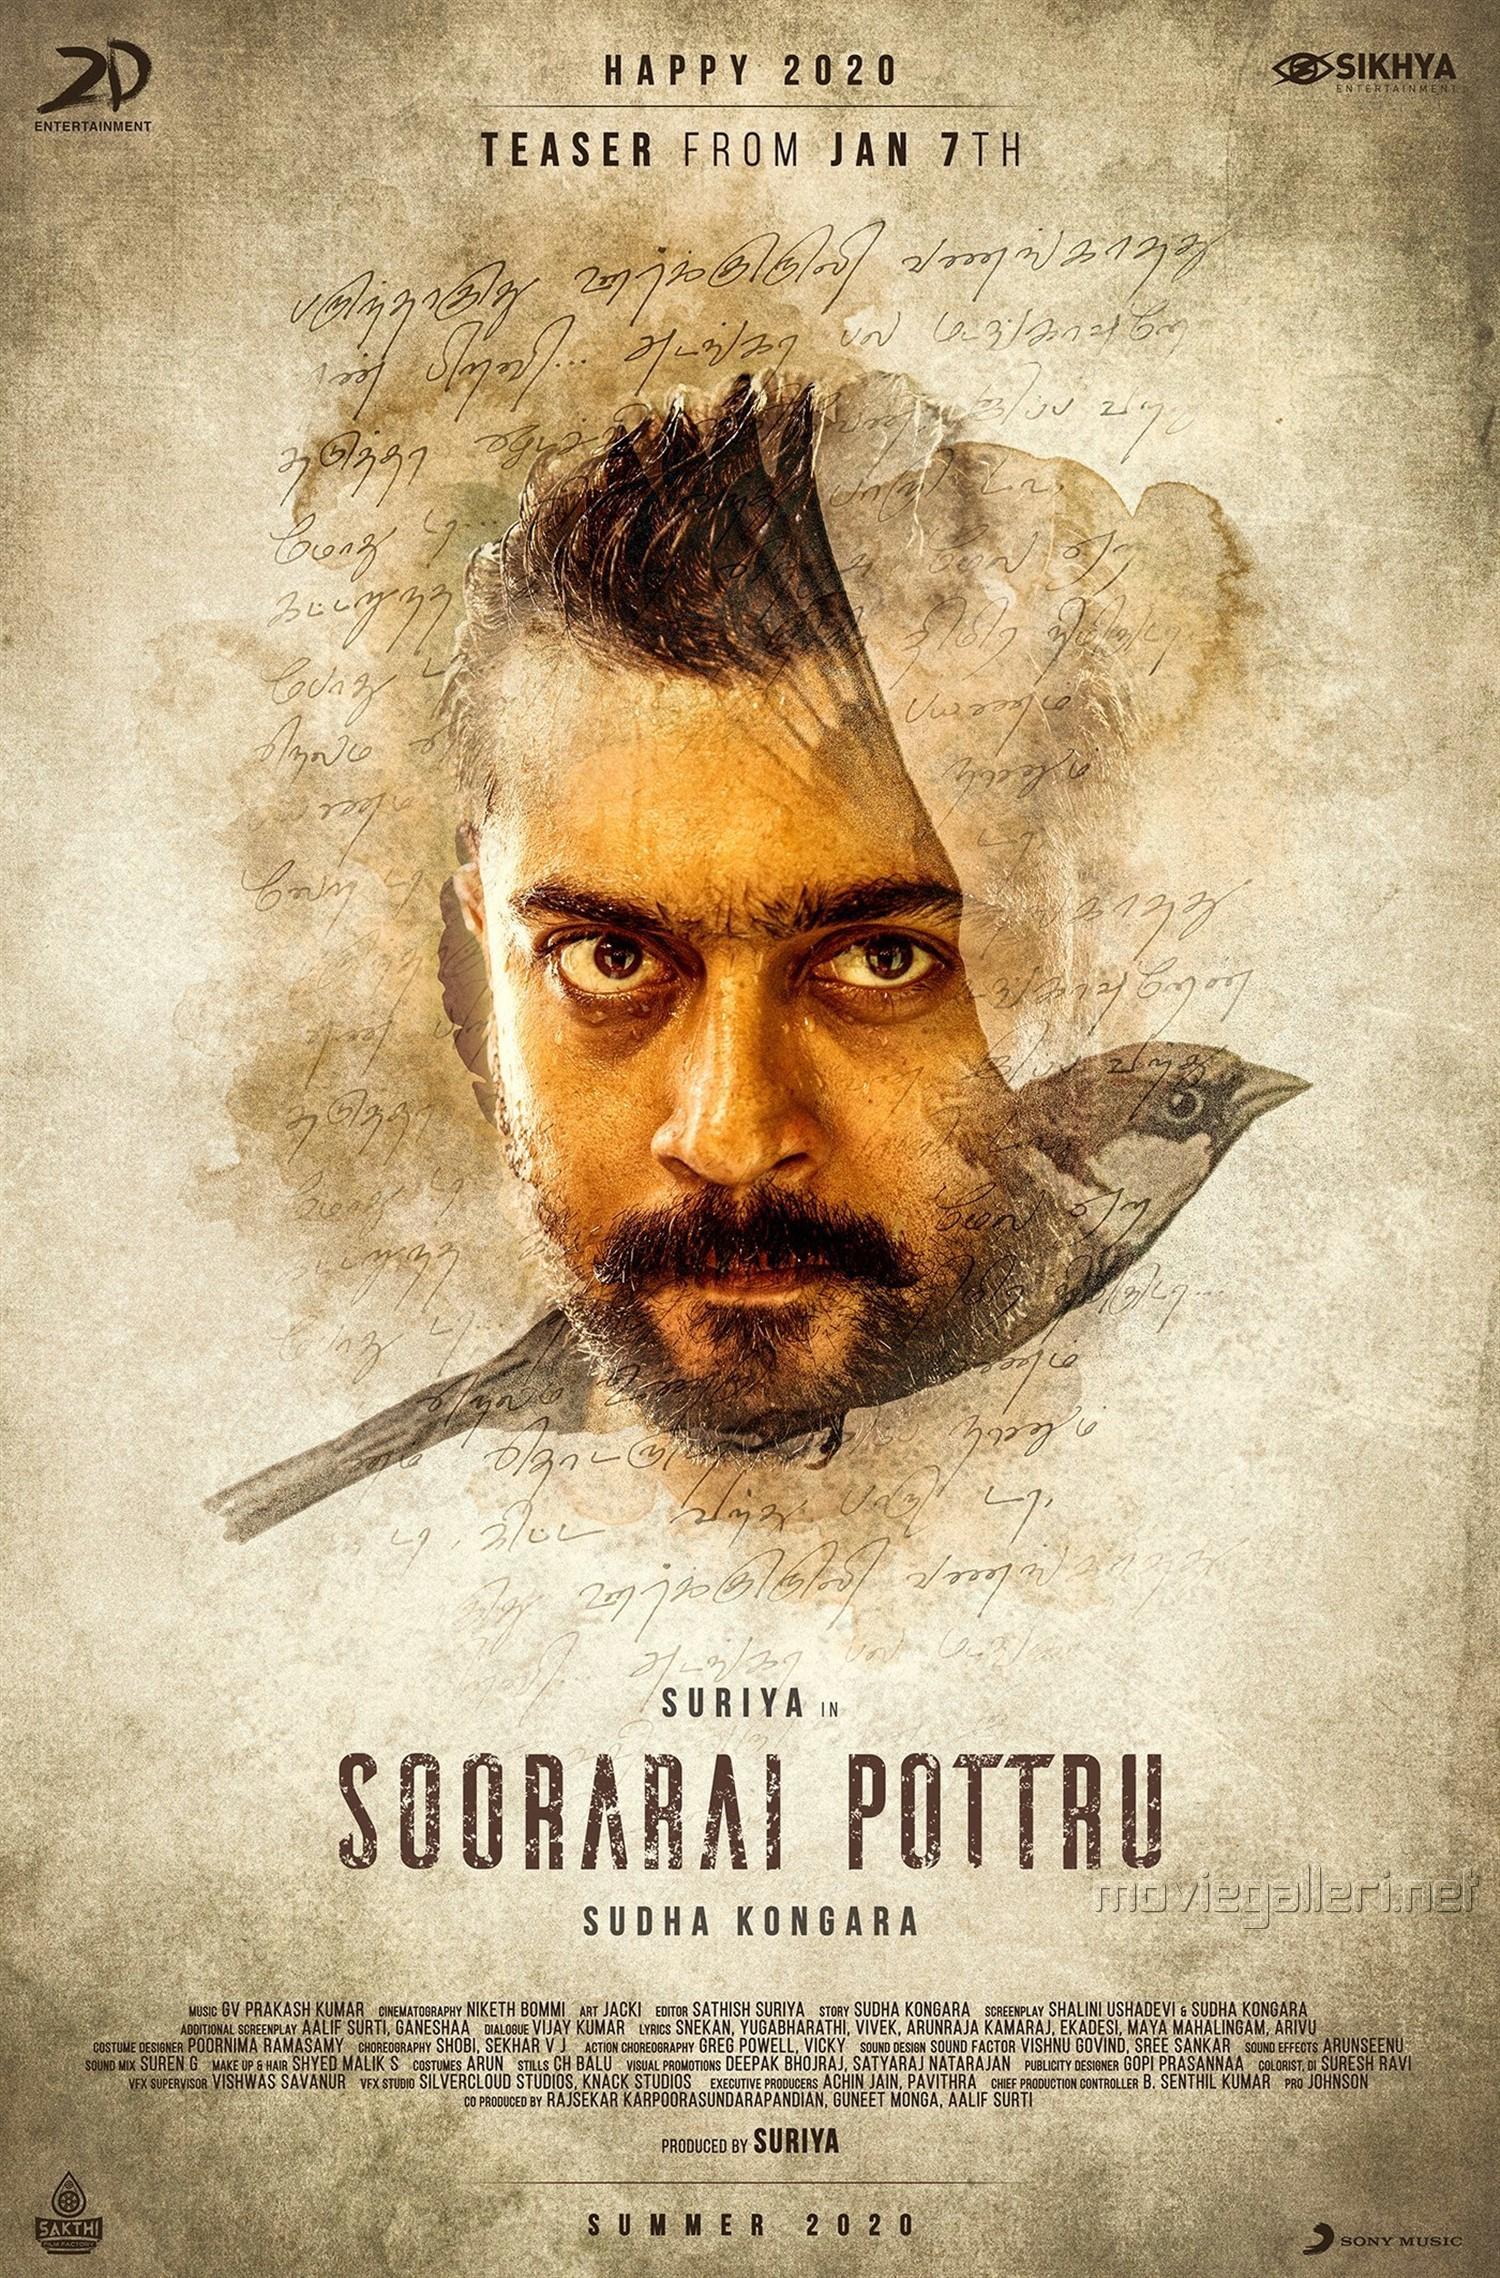 Actor Suriya Soorarai Pottru Second Look Poster HD